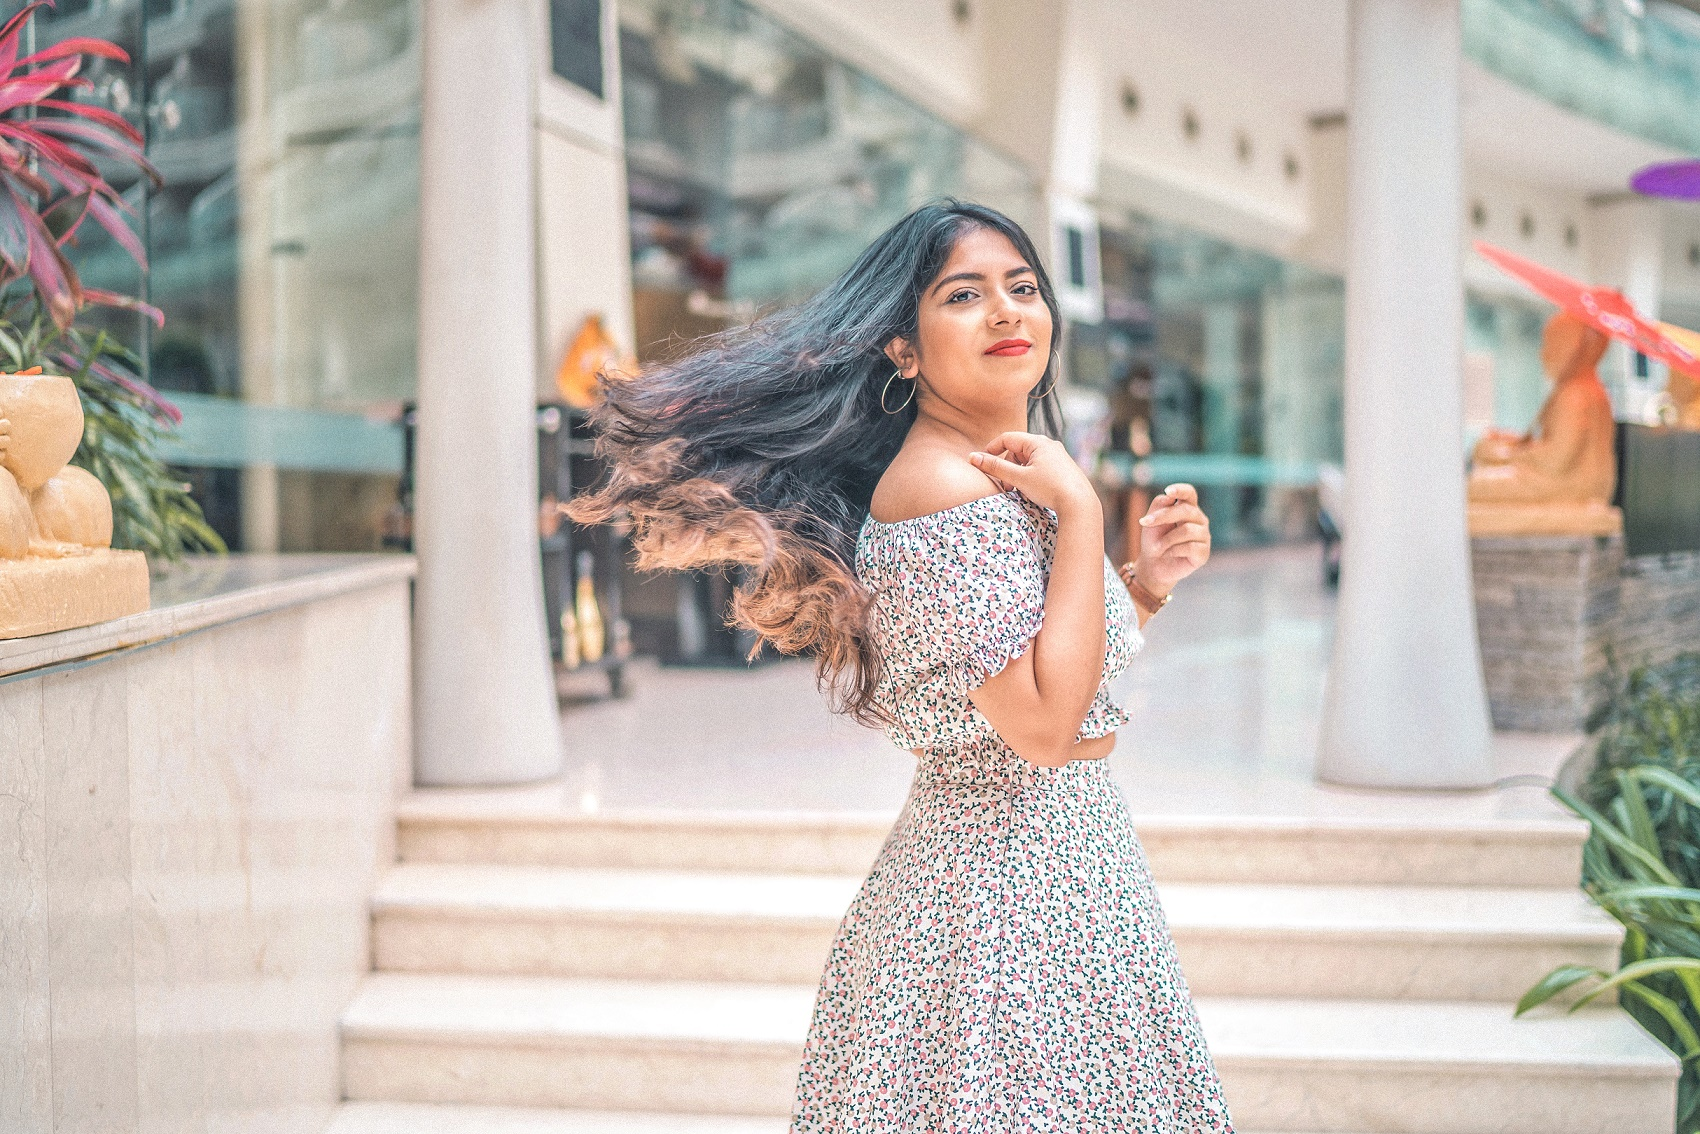 c907810a3bfa Bhumika Thakkar Blogs OOTD: Love For Co-Ords | BlogAdda